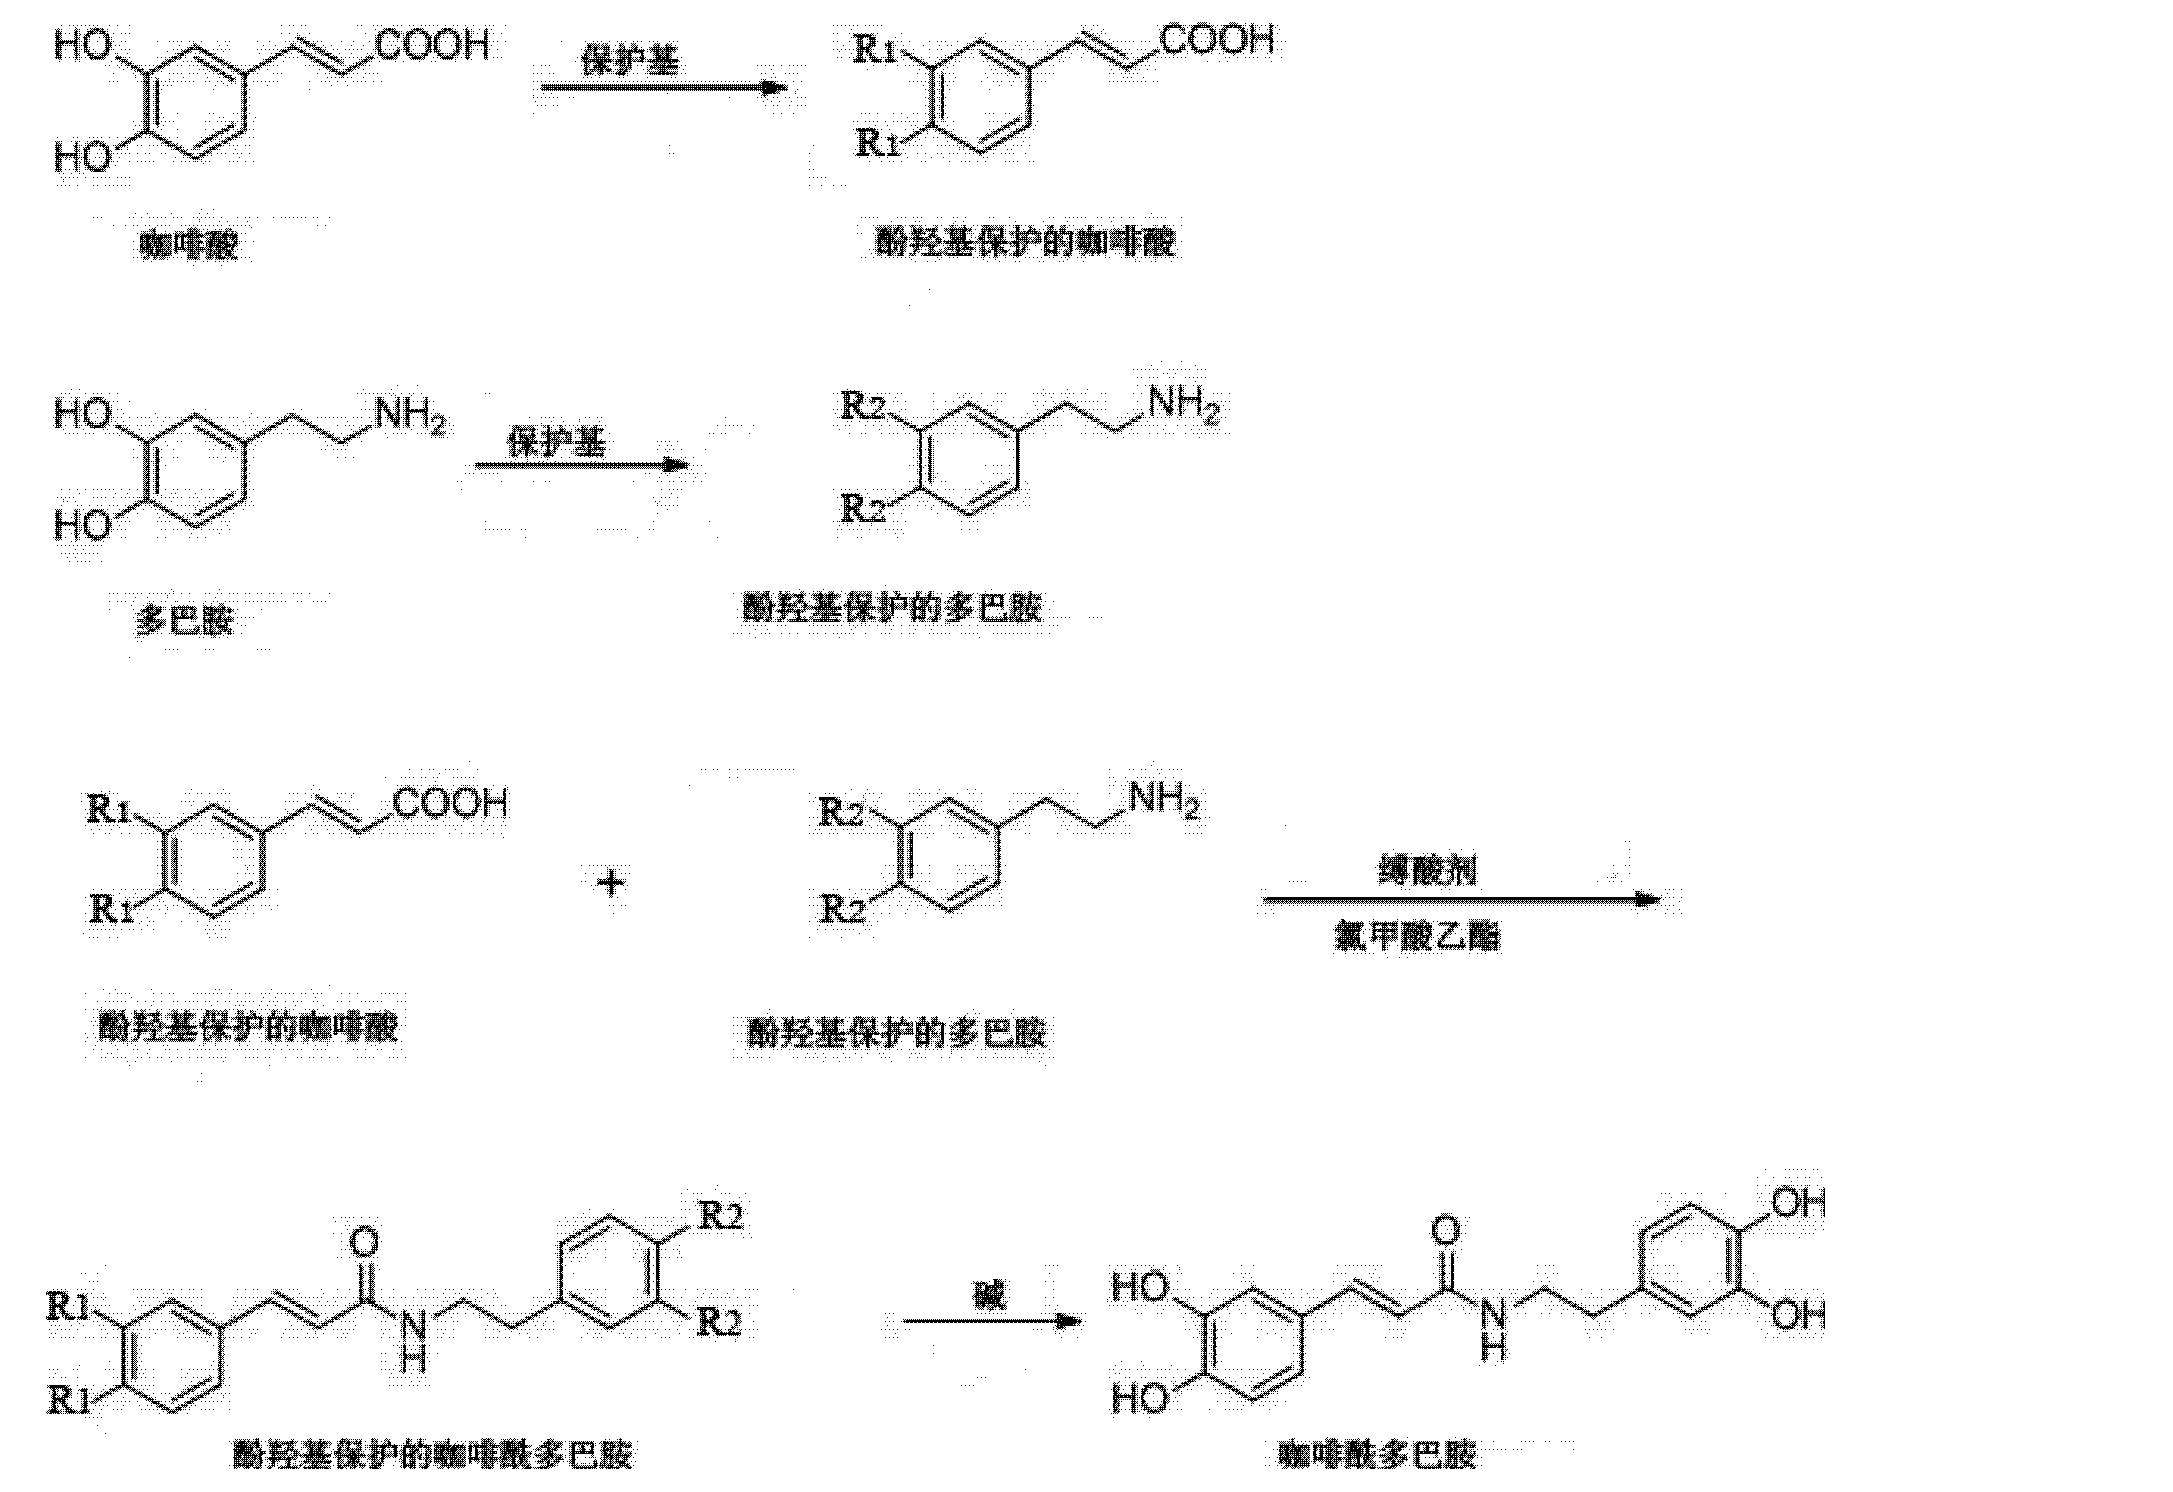 Patent CN103012181B - 一種咖啡酰多巴胺的合成方法 - Google Patents